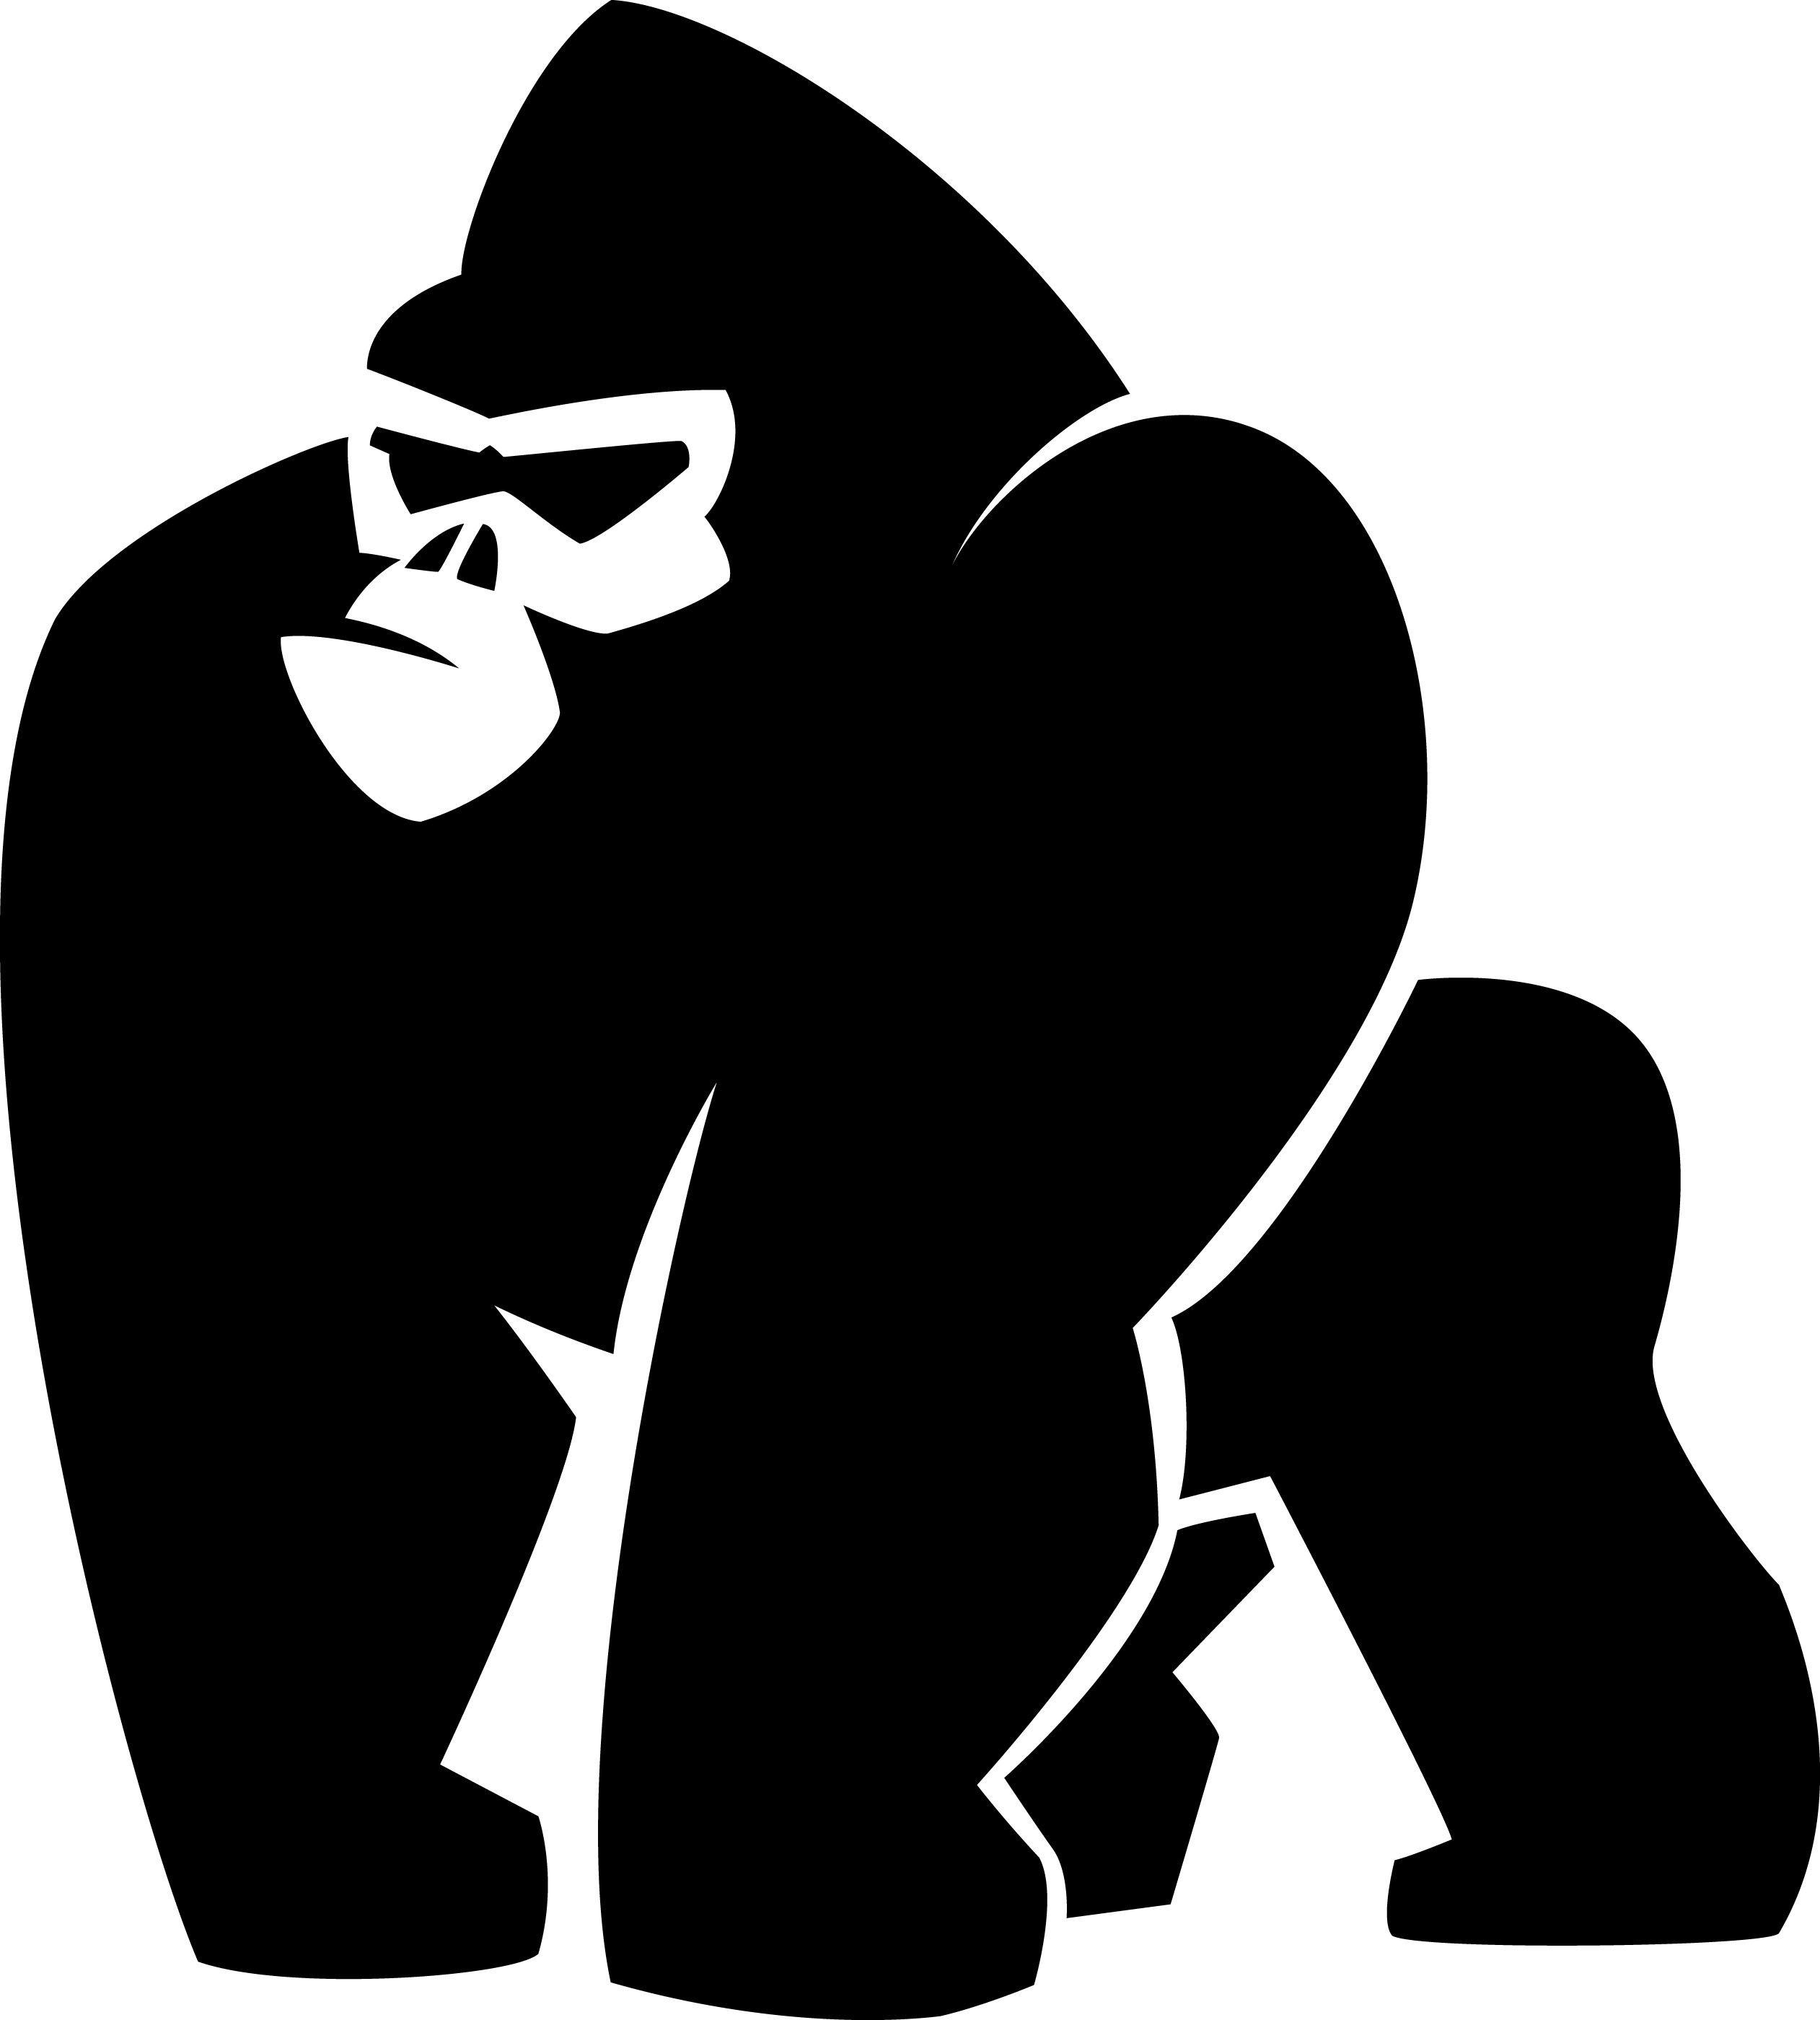 gorilla jpg 2523 2800 tattoos pinterest tattoo and body art rh pinterest com Cartoon Gorilla Cartoon Gorilla